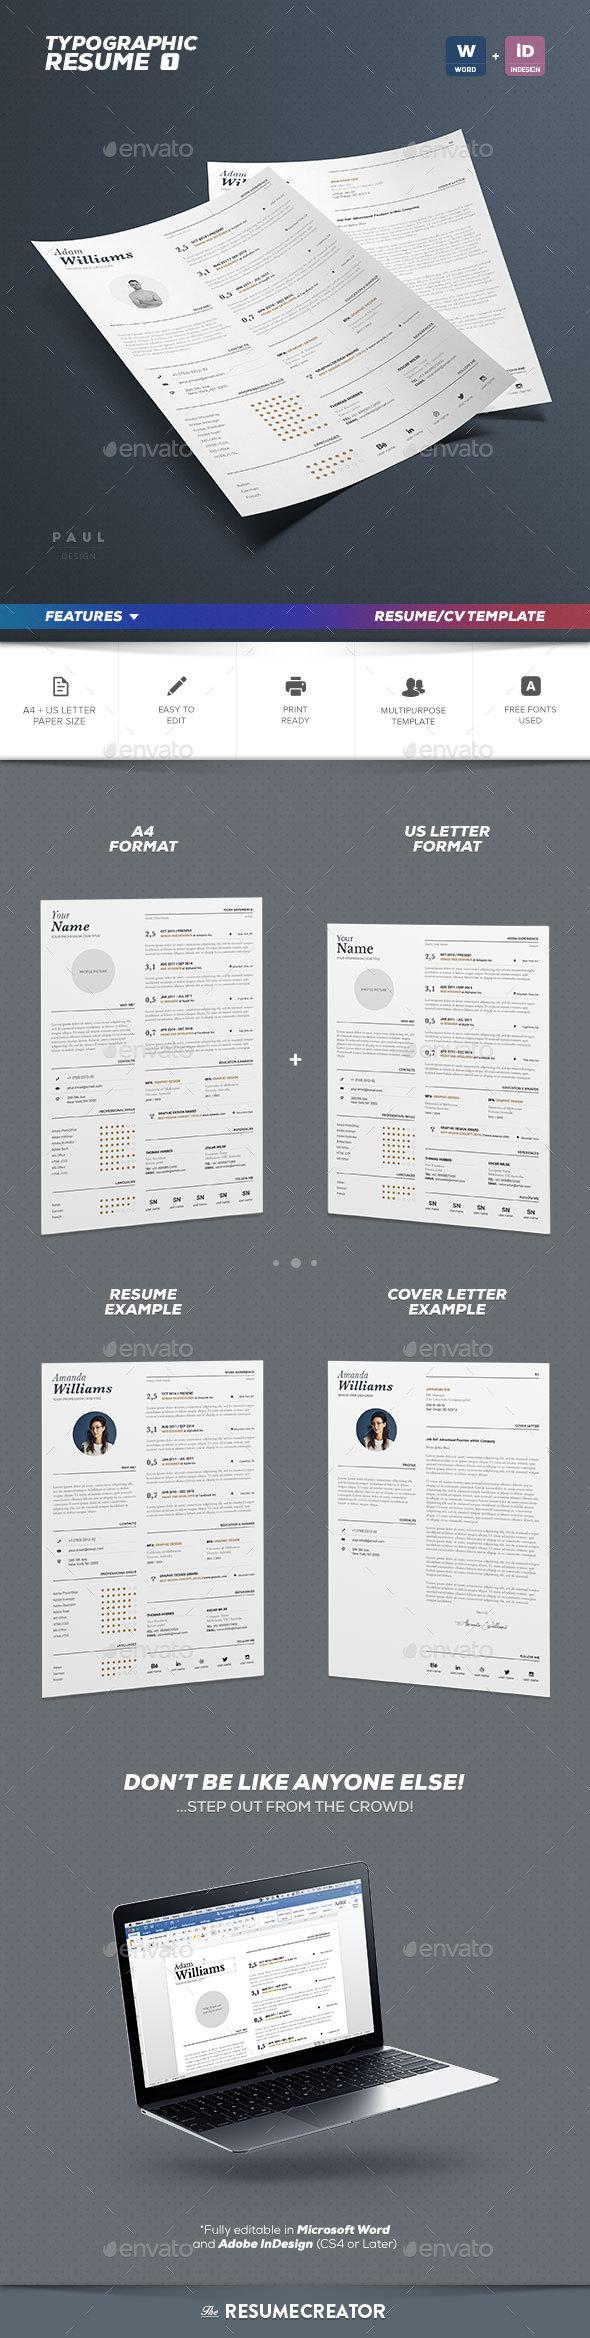 Typographic Resume Vol. 1 - Resumes Stationery